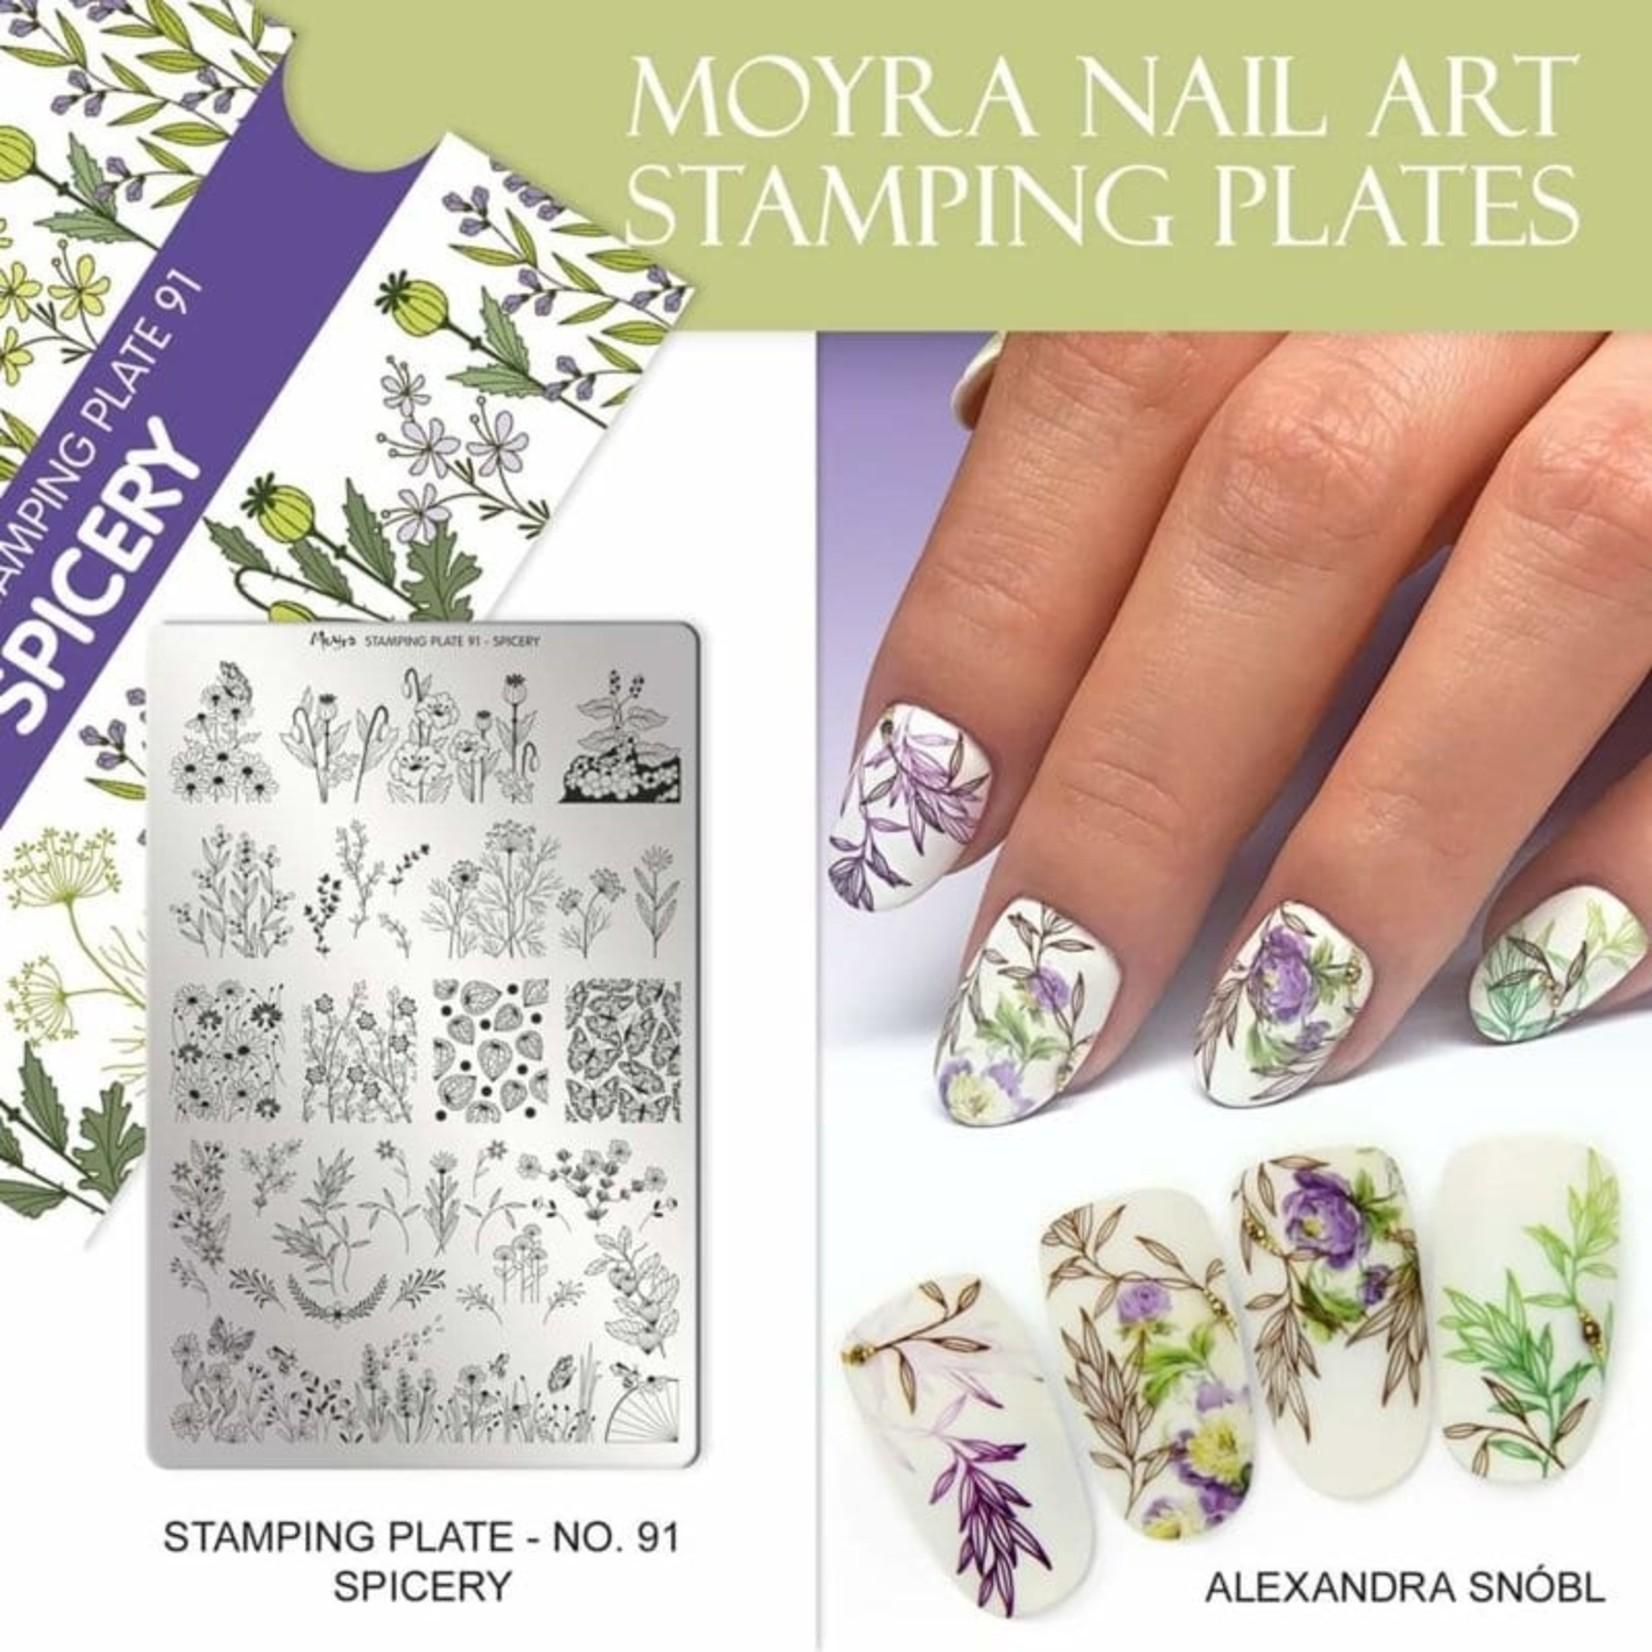 Moyra Moyra Stamping plate 91 Spicery